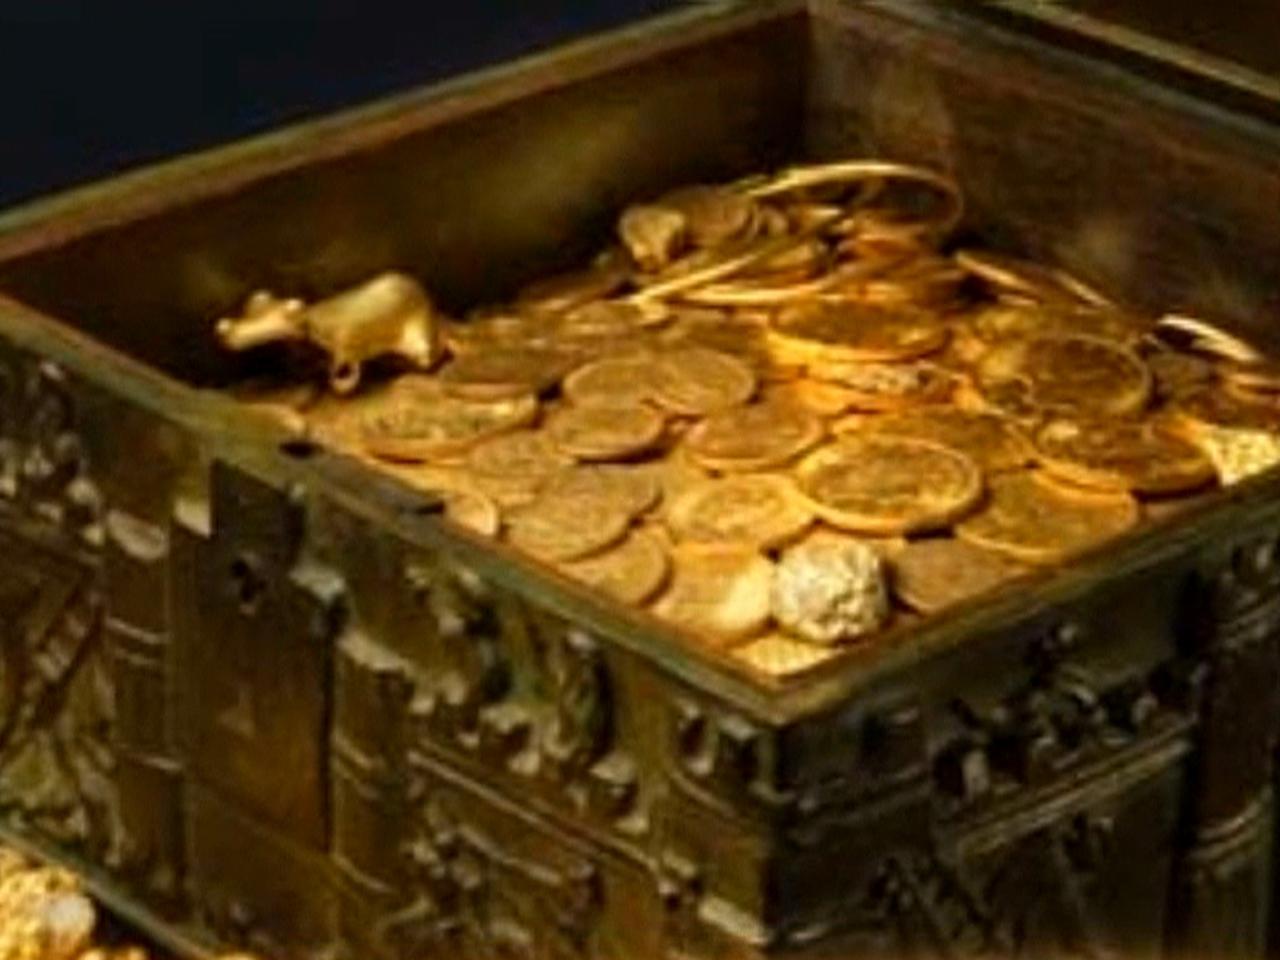 Forrest Fenn Treasure Clues